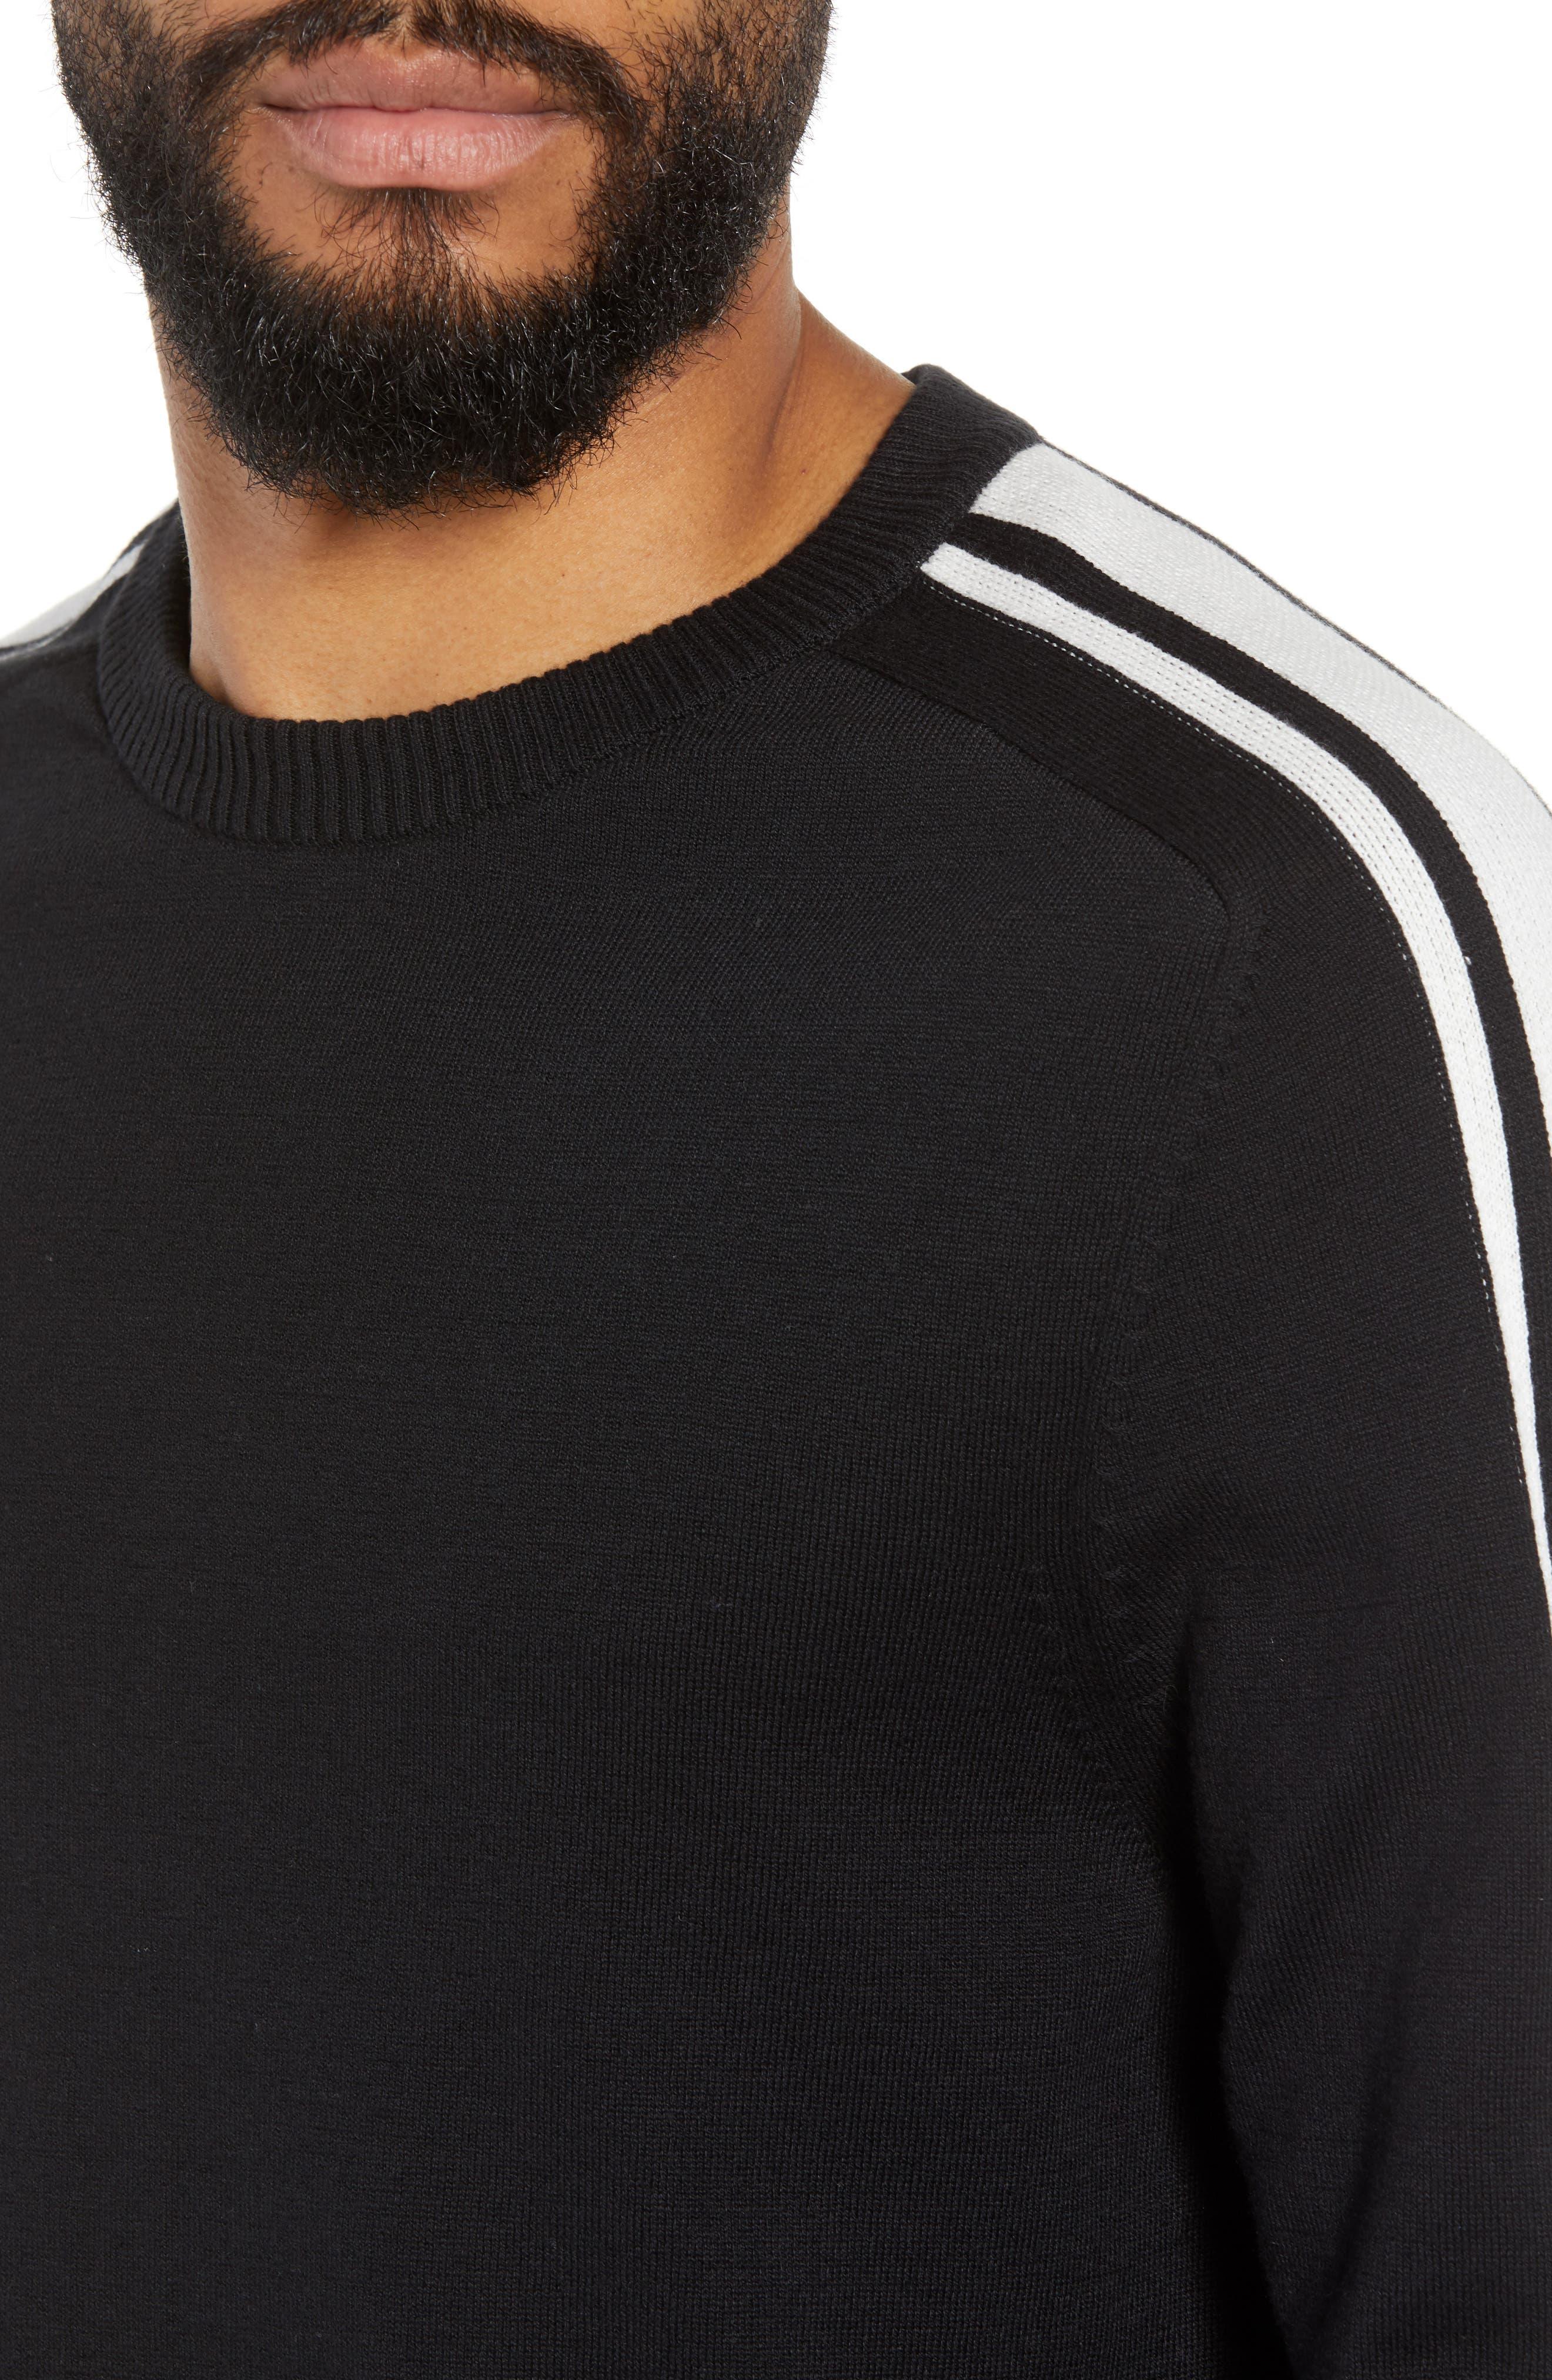 Stripe Sleeve Sweater,                             Alternate thumbnail 4, color,                             Black